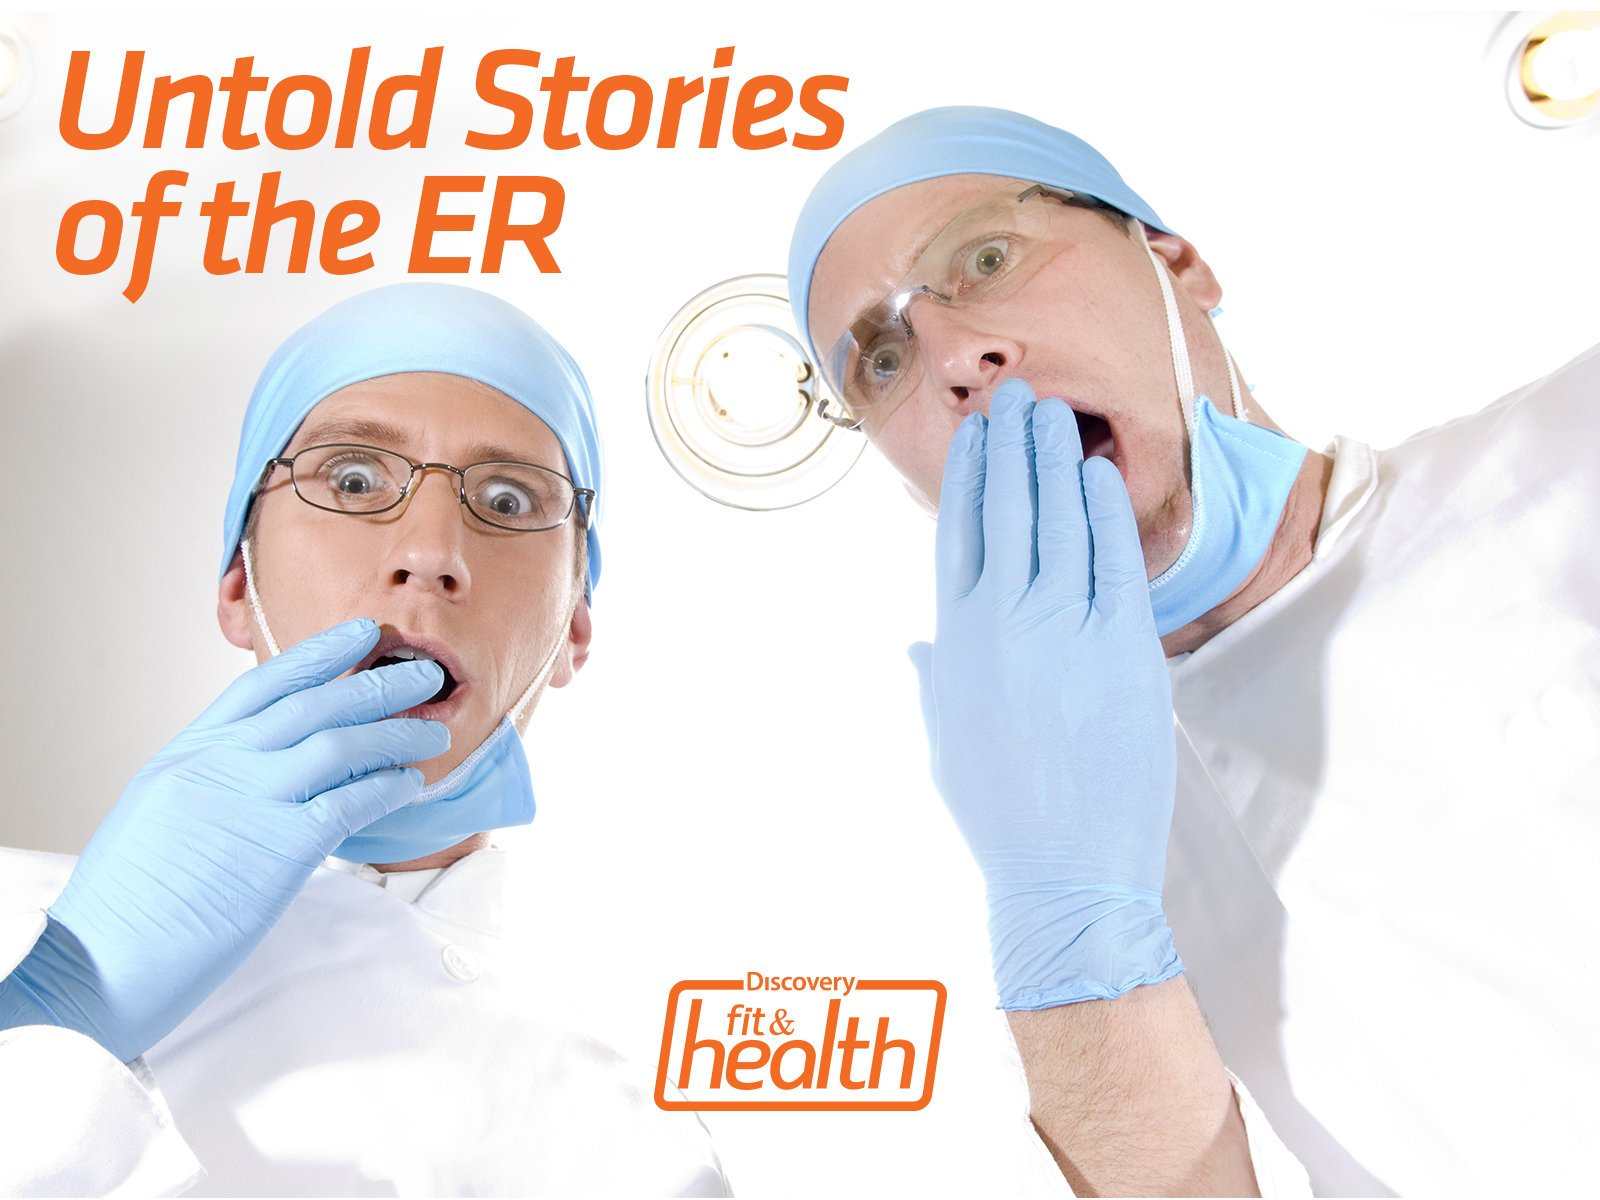 Amazon.com: Untold Stories of the ER Season 10: Amazon Digital Services LLC